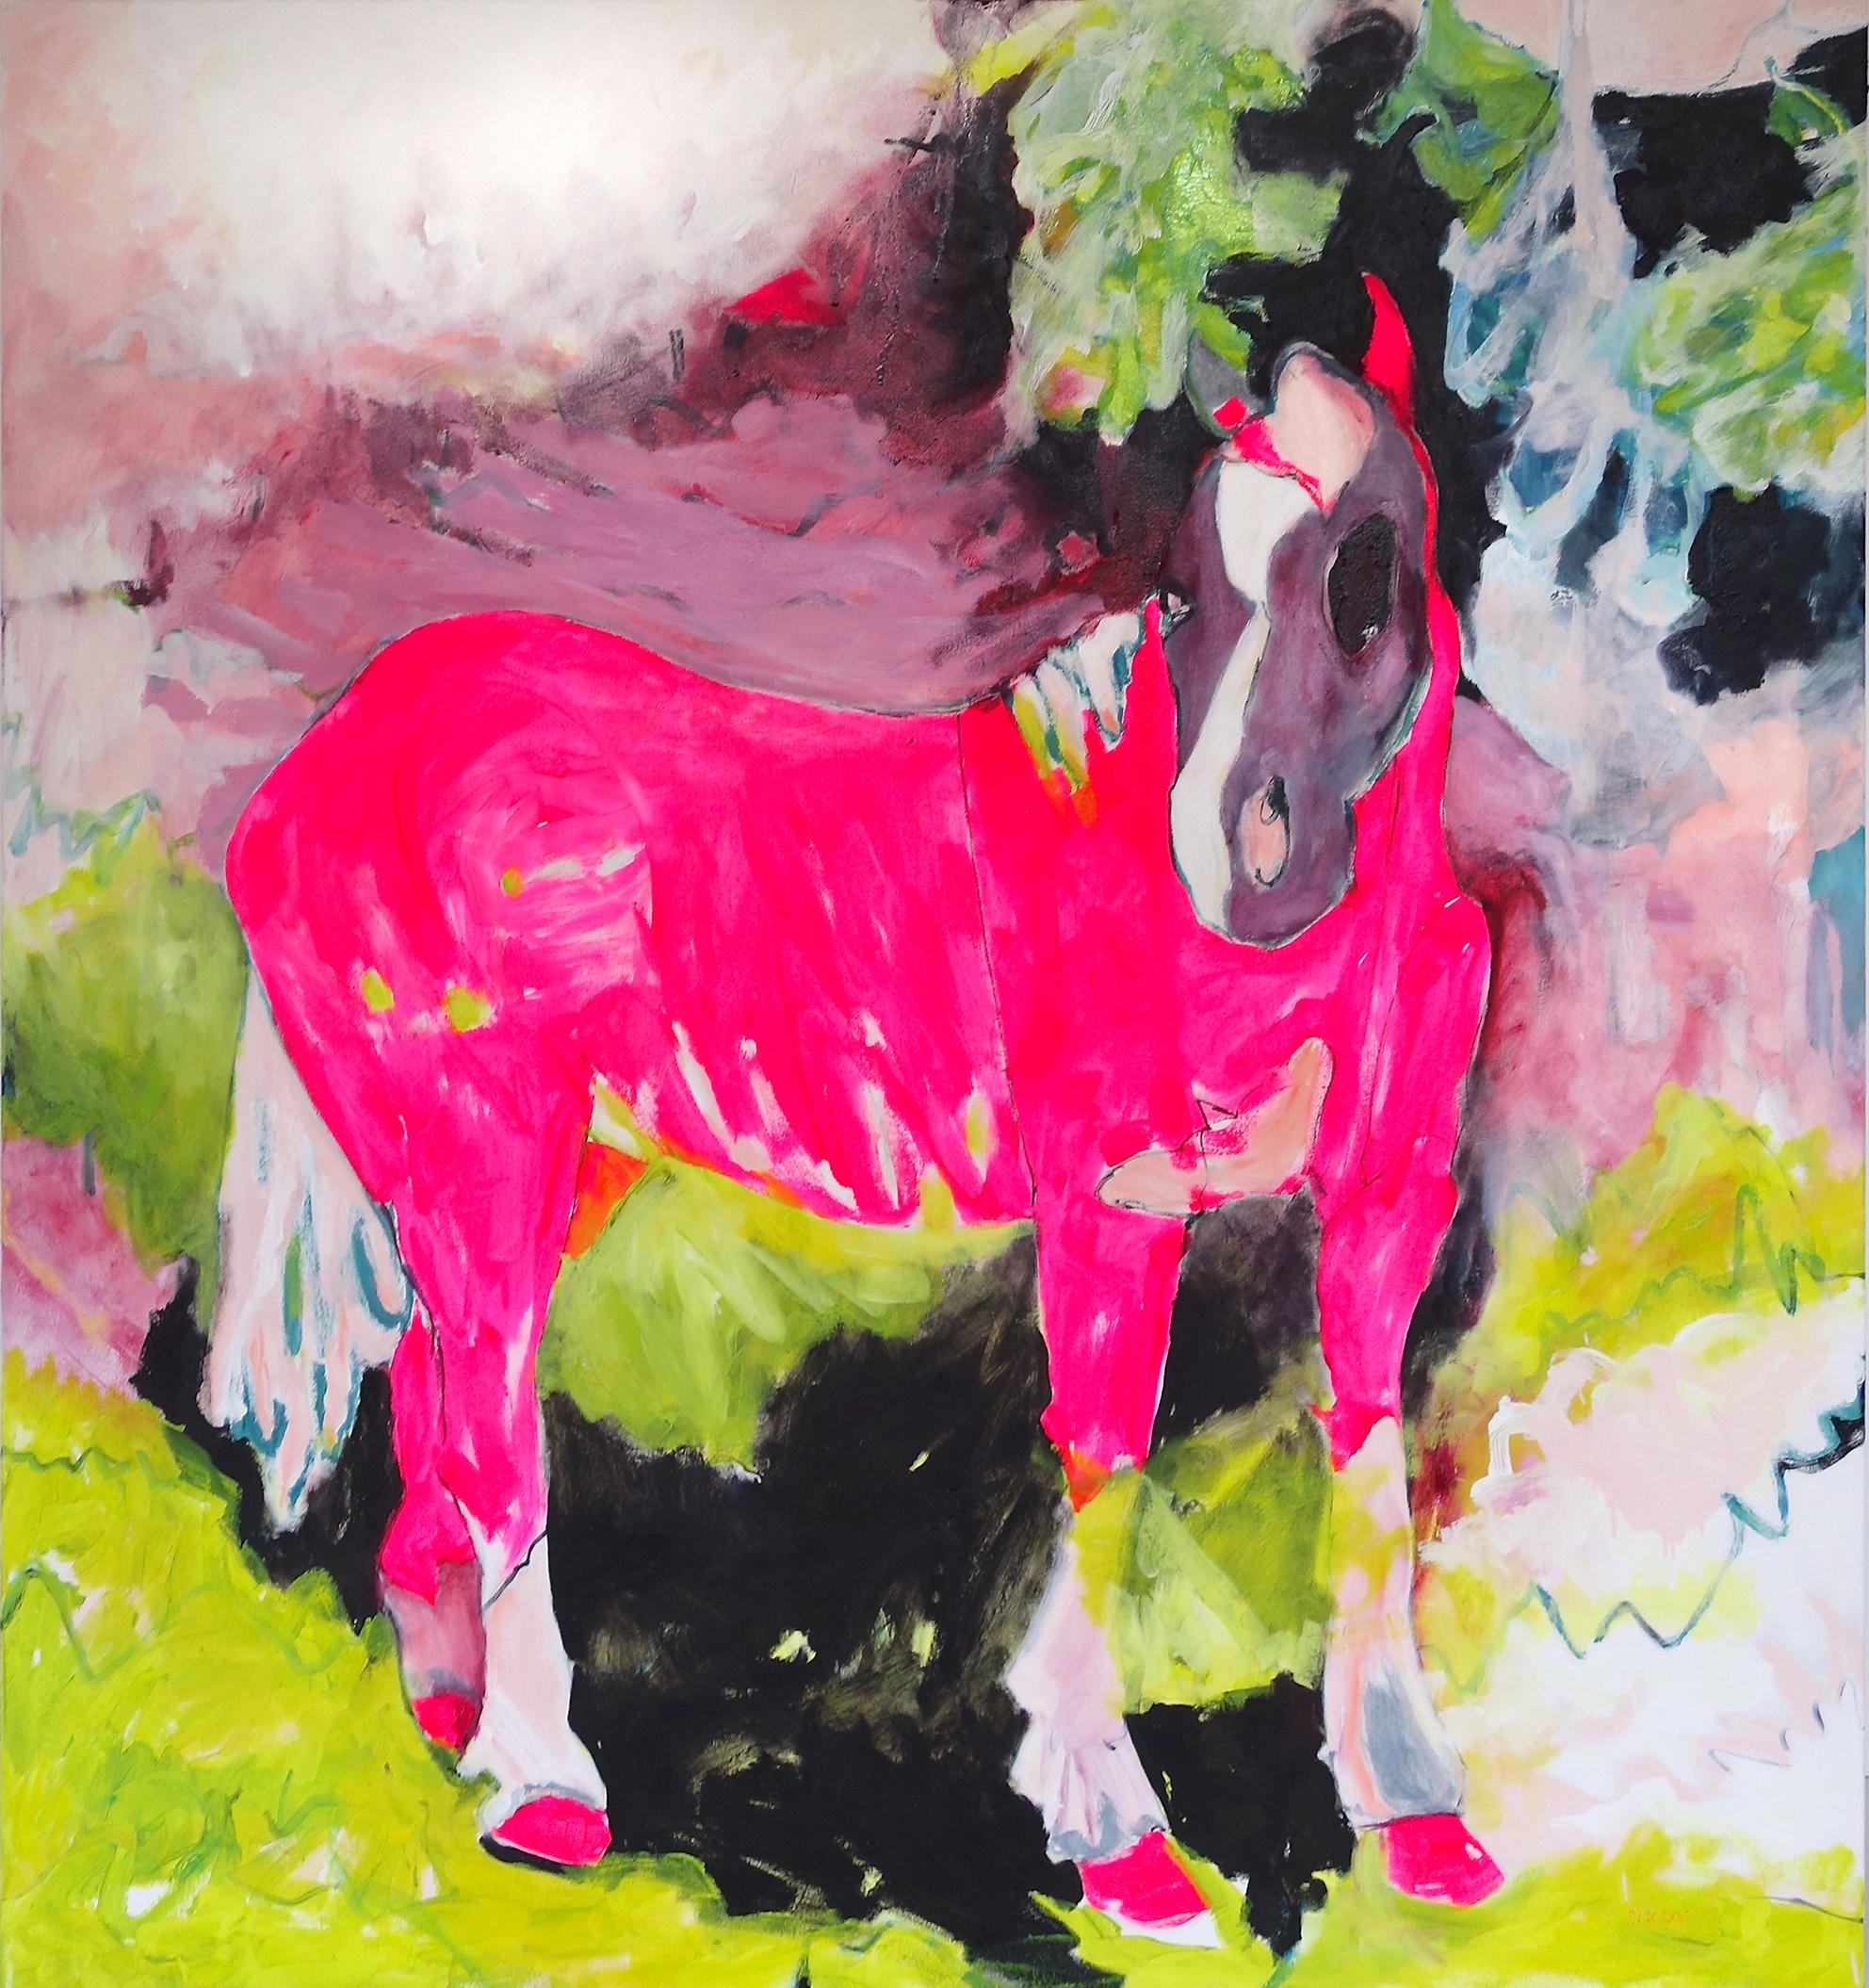 Pink Pony oil on canavas 130 x 140 cm, 2016